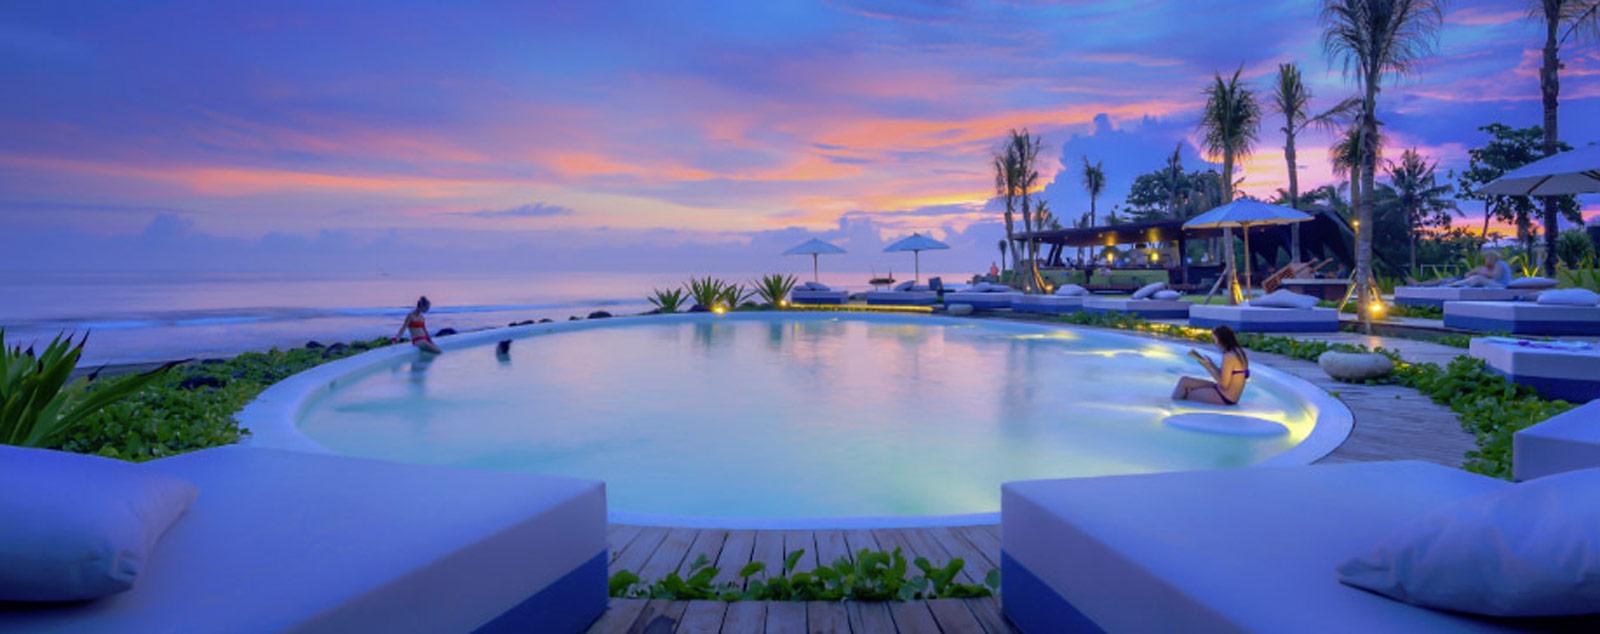 resort 1.jpg